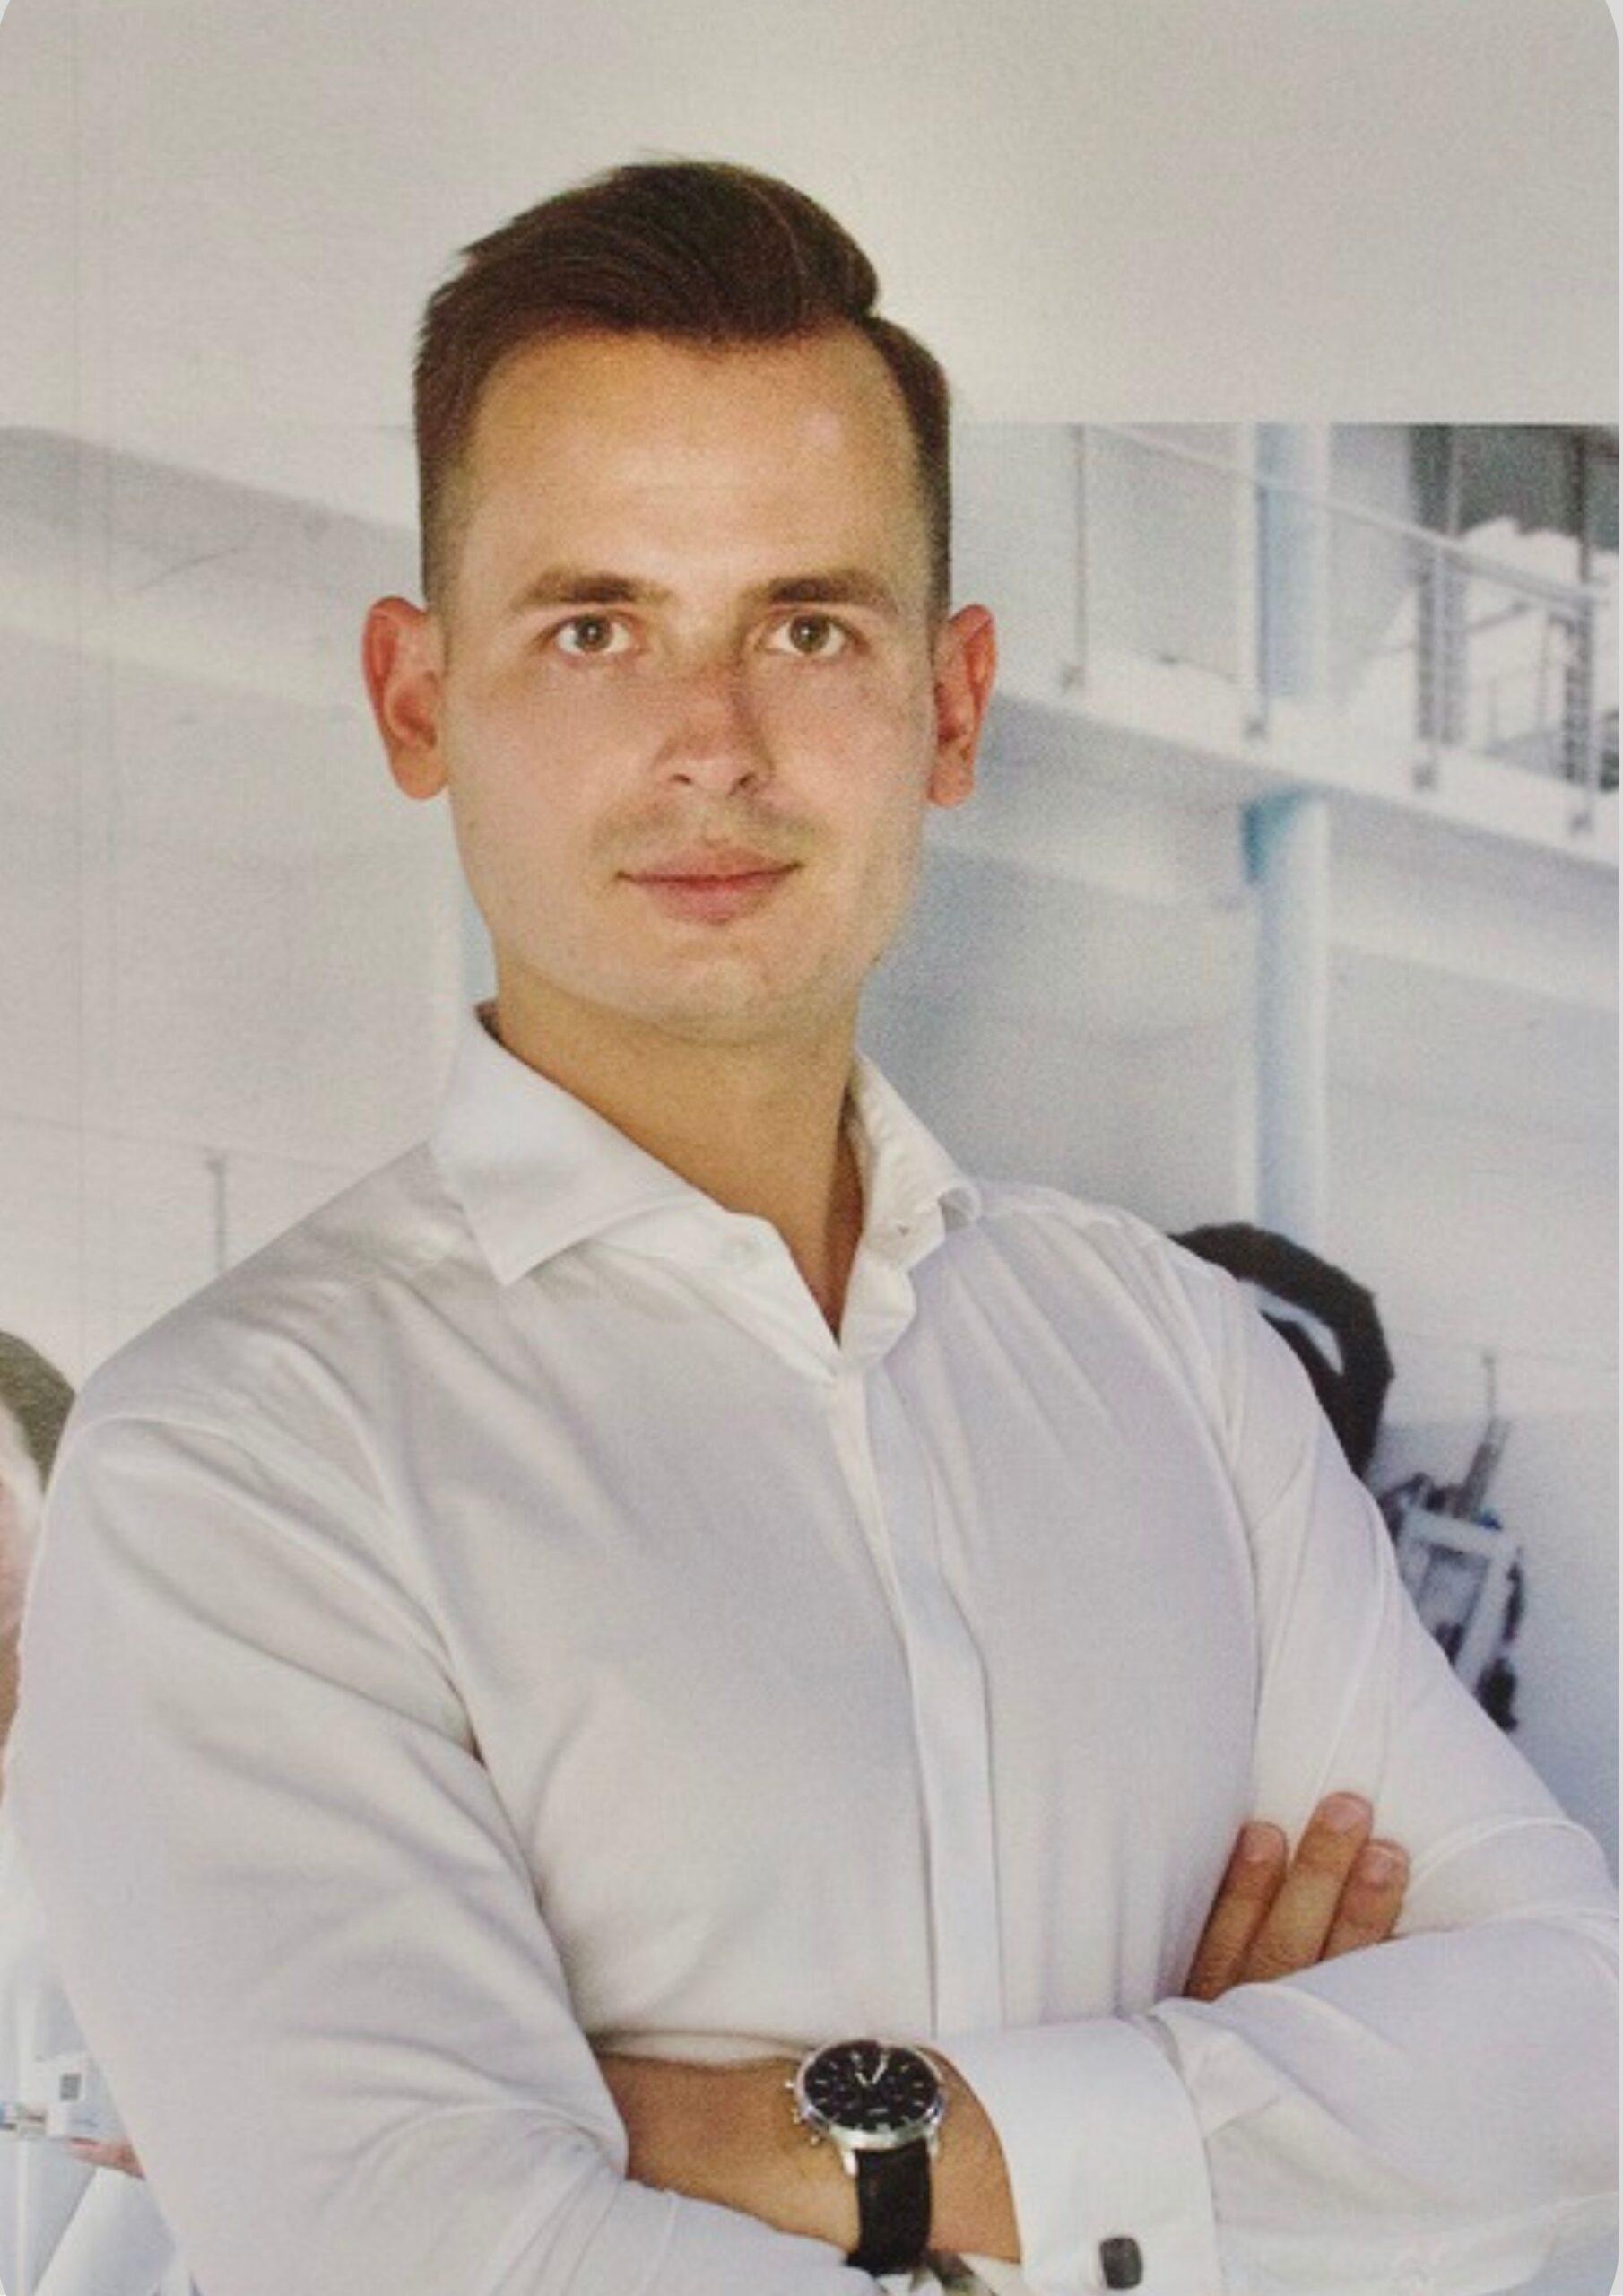 Mr. Adam Kwiatkowski